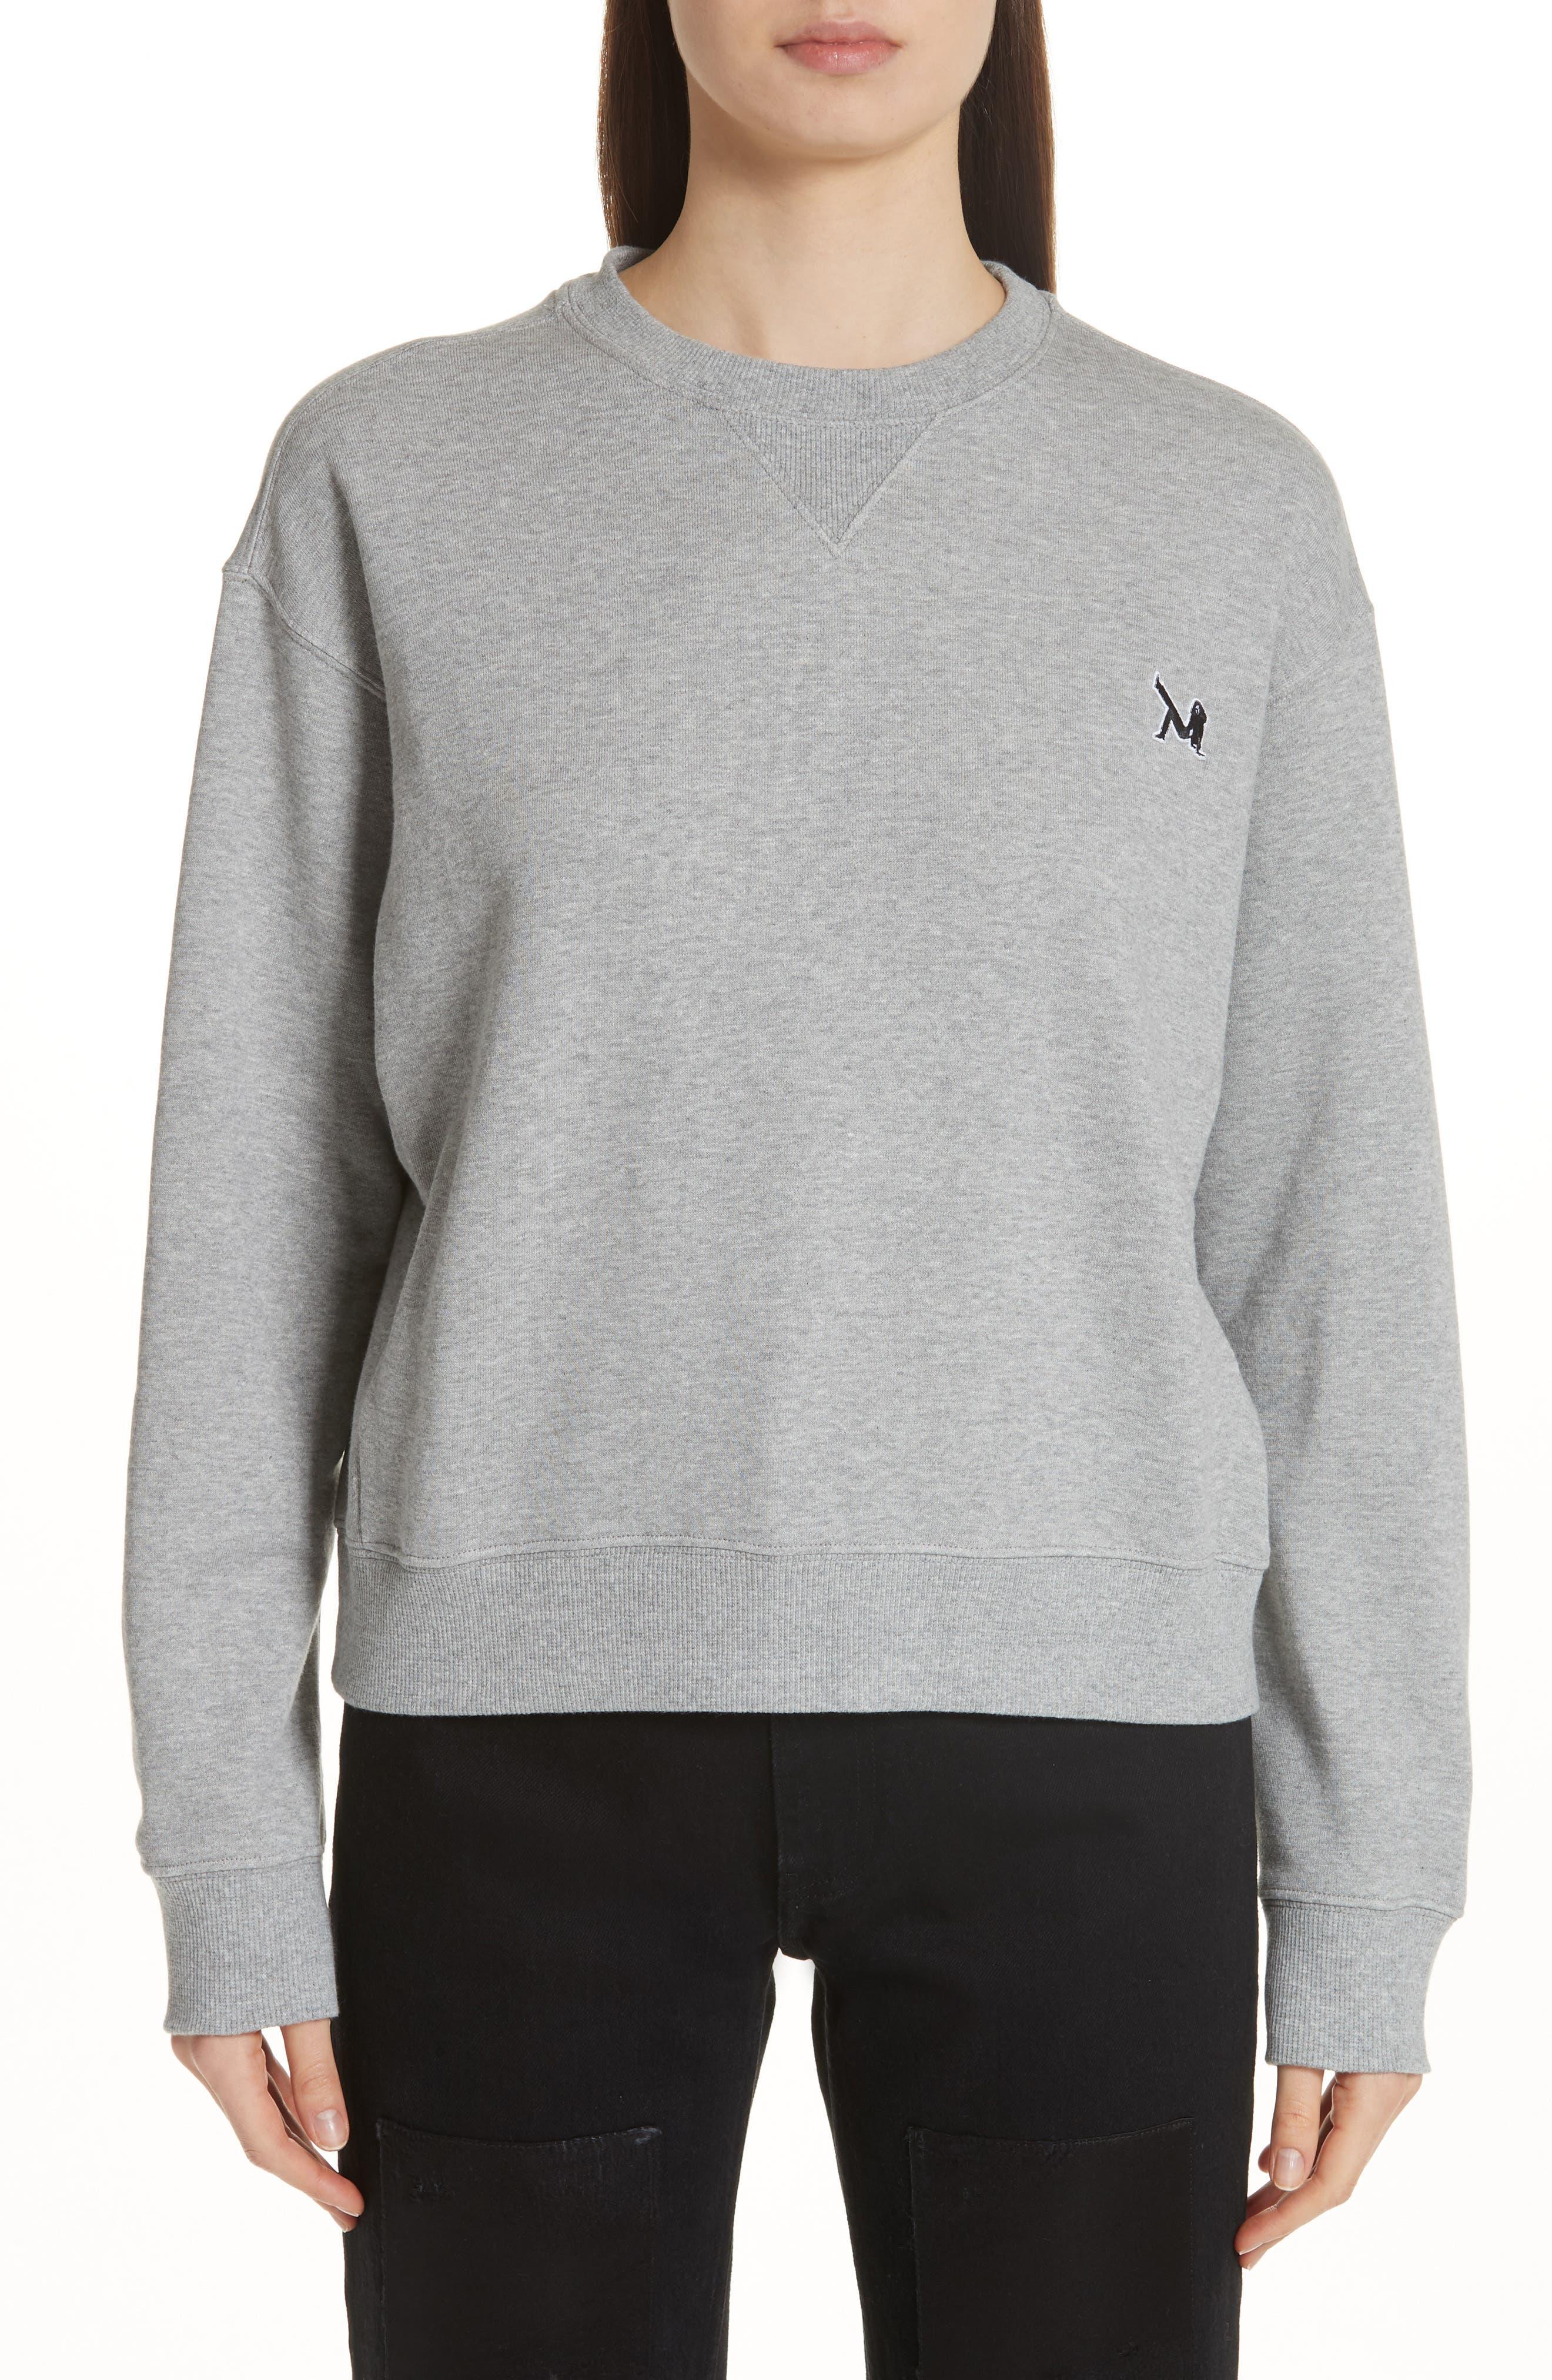 Brooke Shields Patch Sweatshirt,                             Main thumbnail 1, color,                             Grey